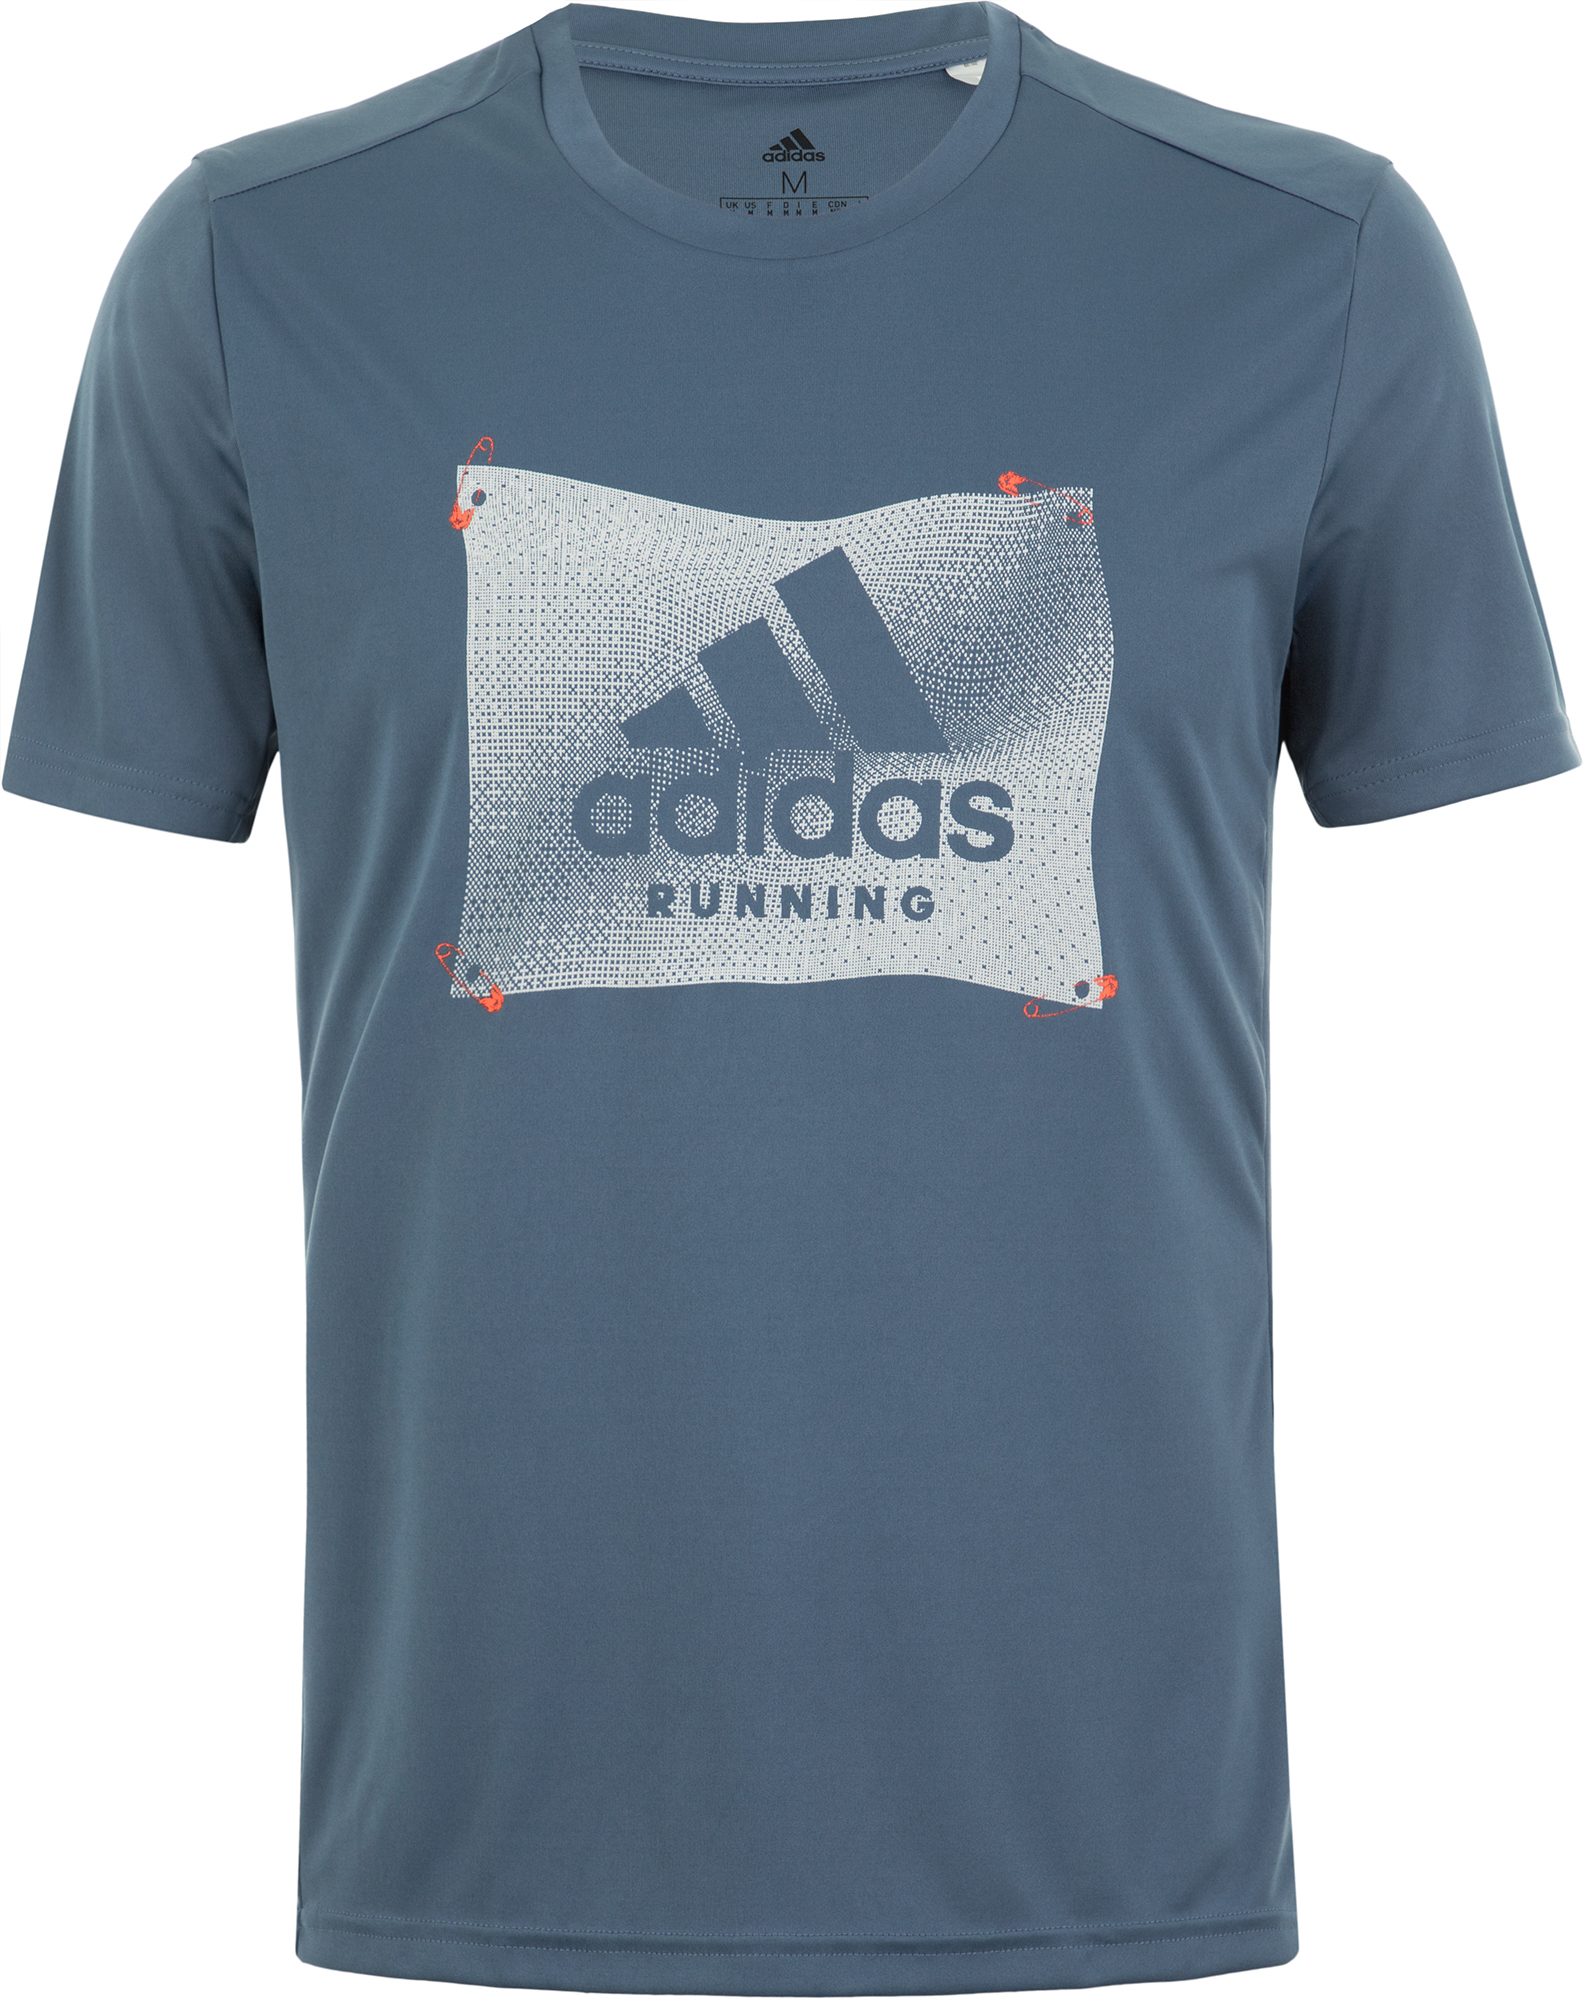 Adidas Футболка мужская Adidas, размер 54